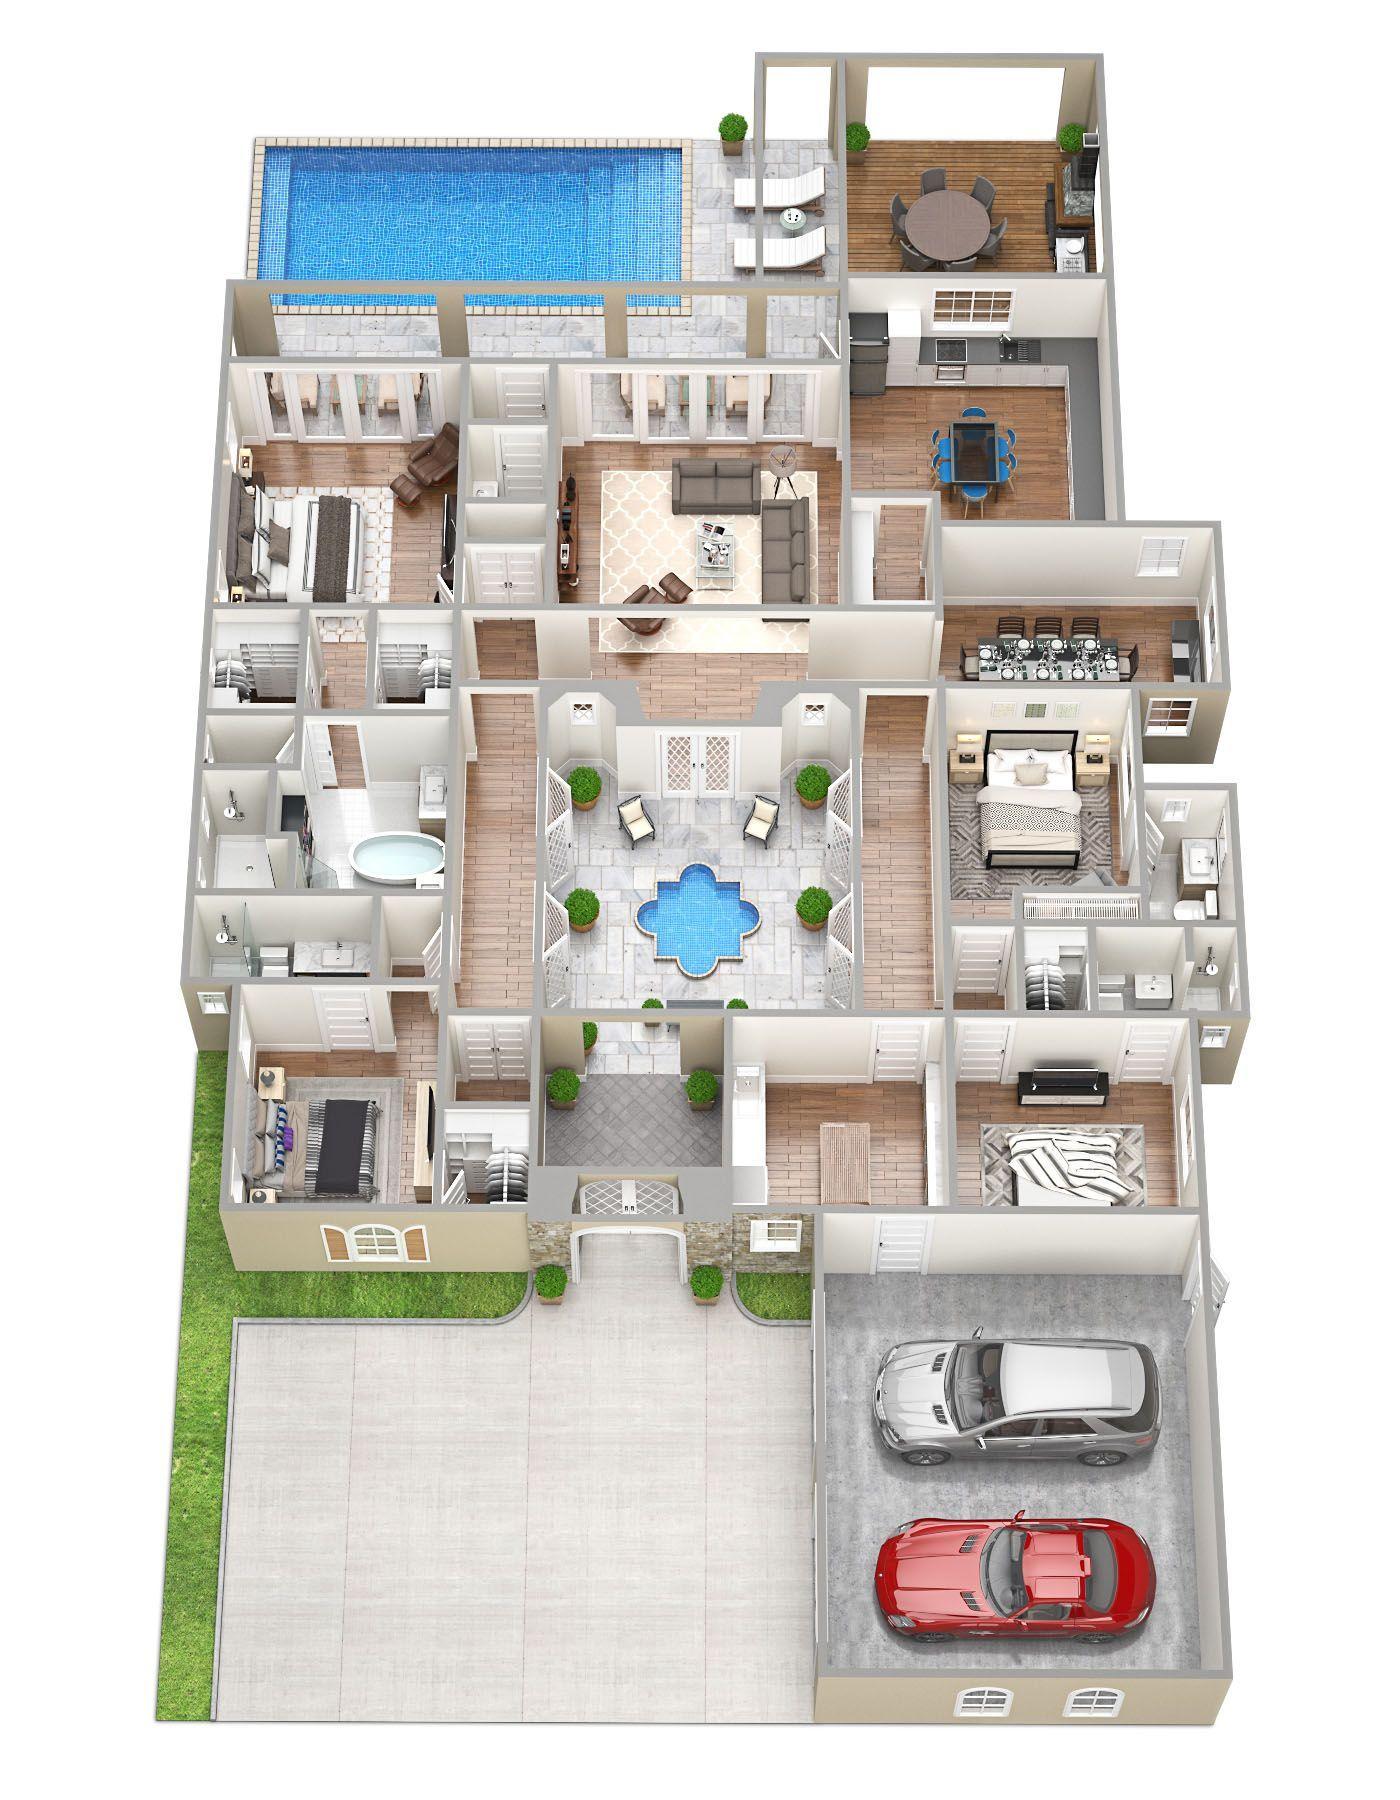 3d Floor Plans Pool House Plans 4 Bedroom House Plans Sims House Design